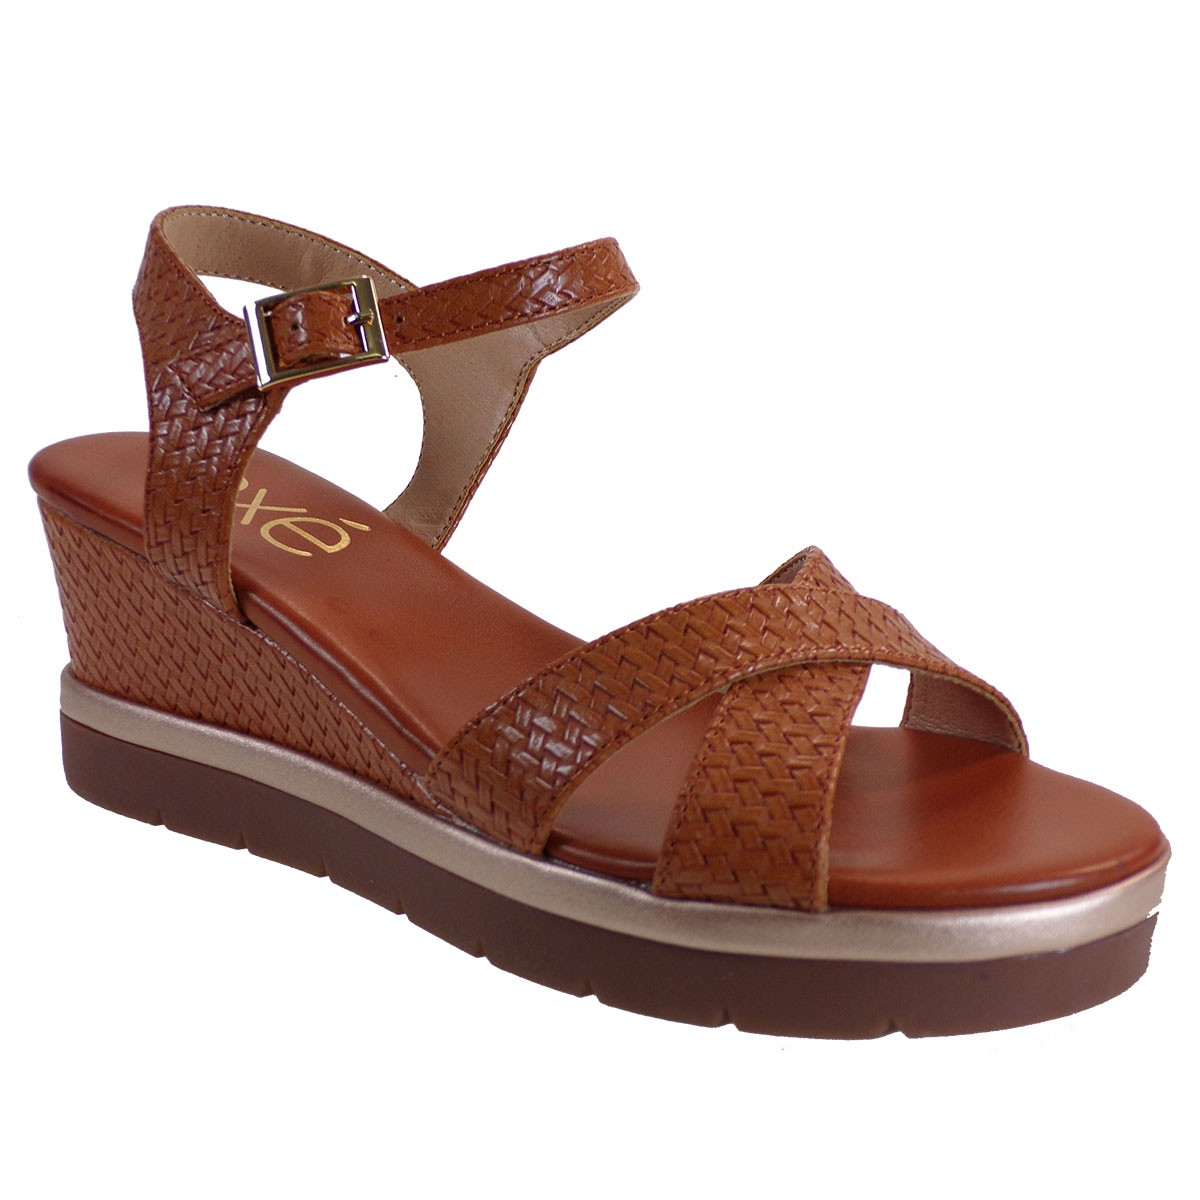 EXE Shoes Γυναικεία Πέδιλα Πλατφόρμες IPANEMA-920 Ταμπά Στάμπα M47009203U52